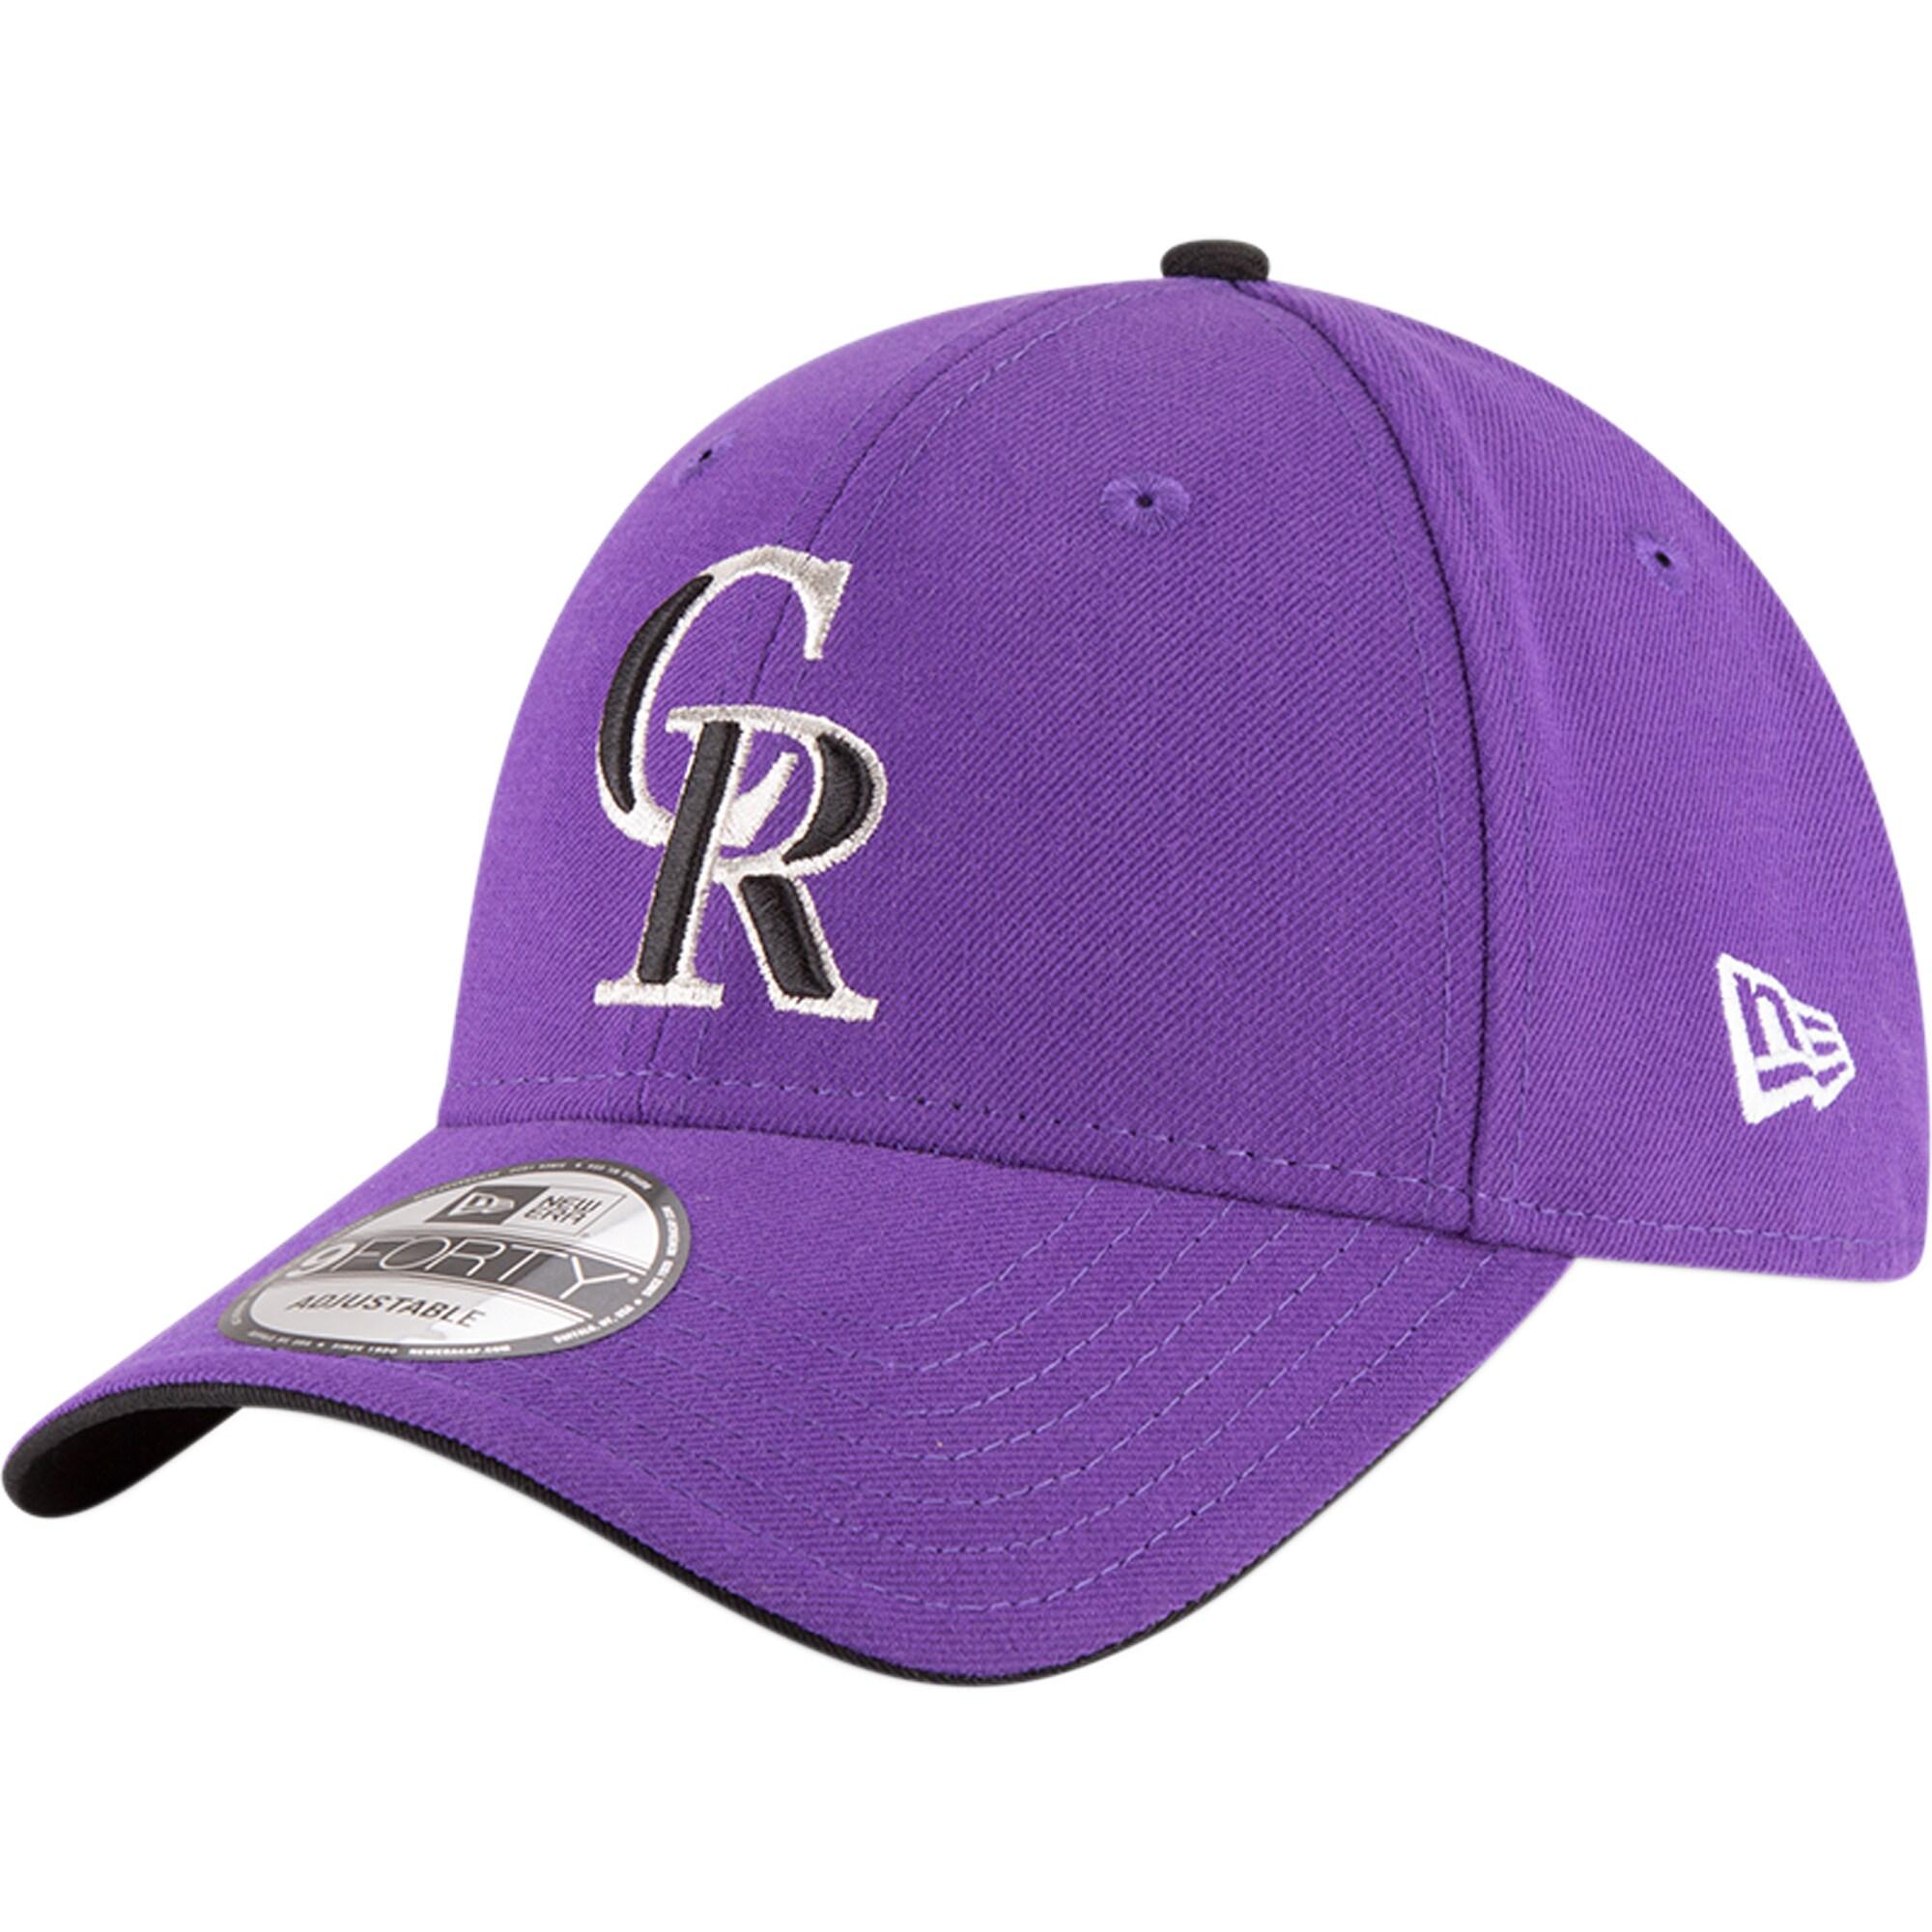 Colorado Rockies New Era Alternate 2 The League 9FORTY Adjustable Hat - Purple